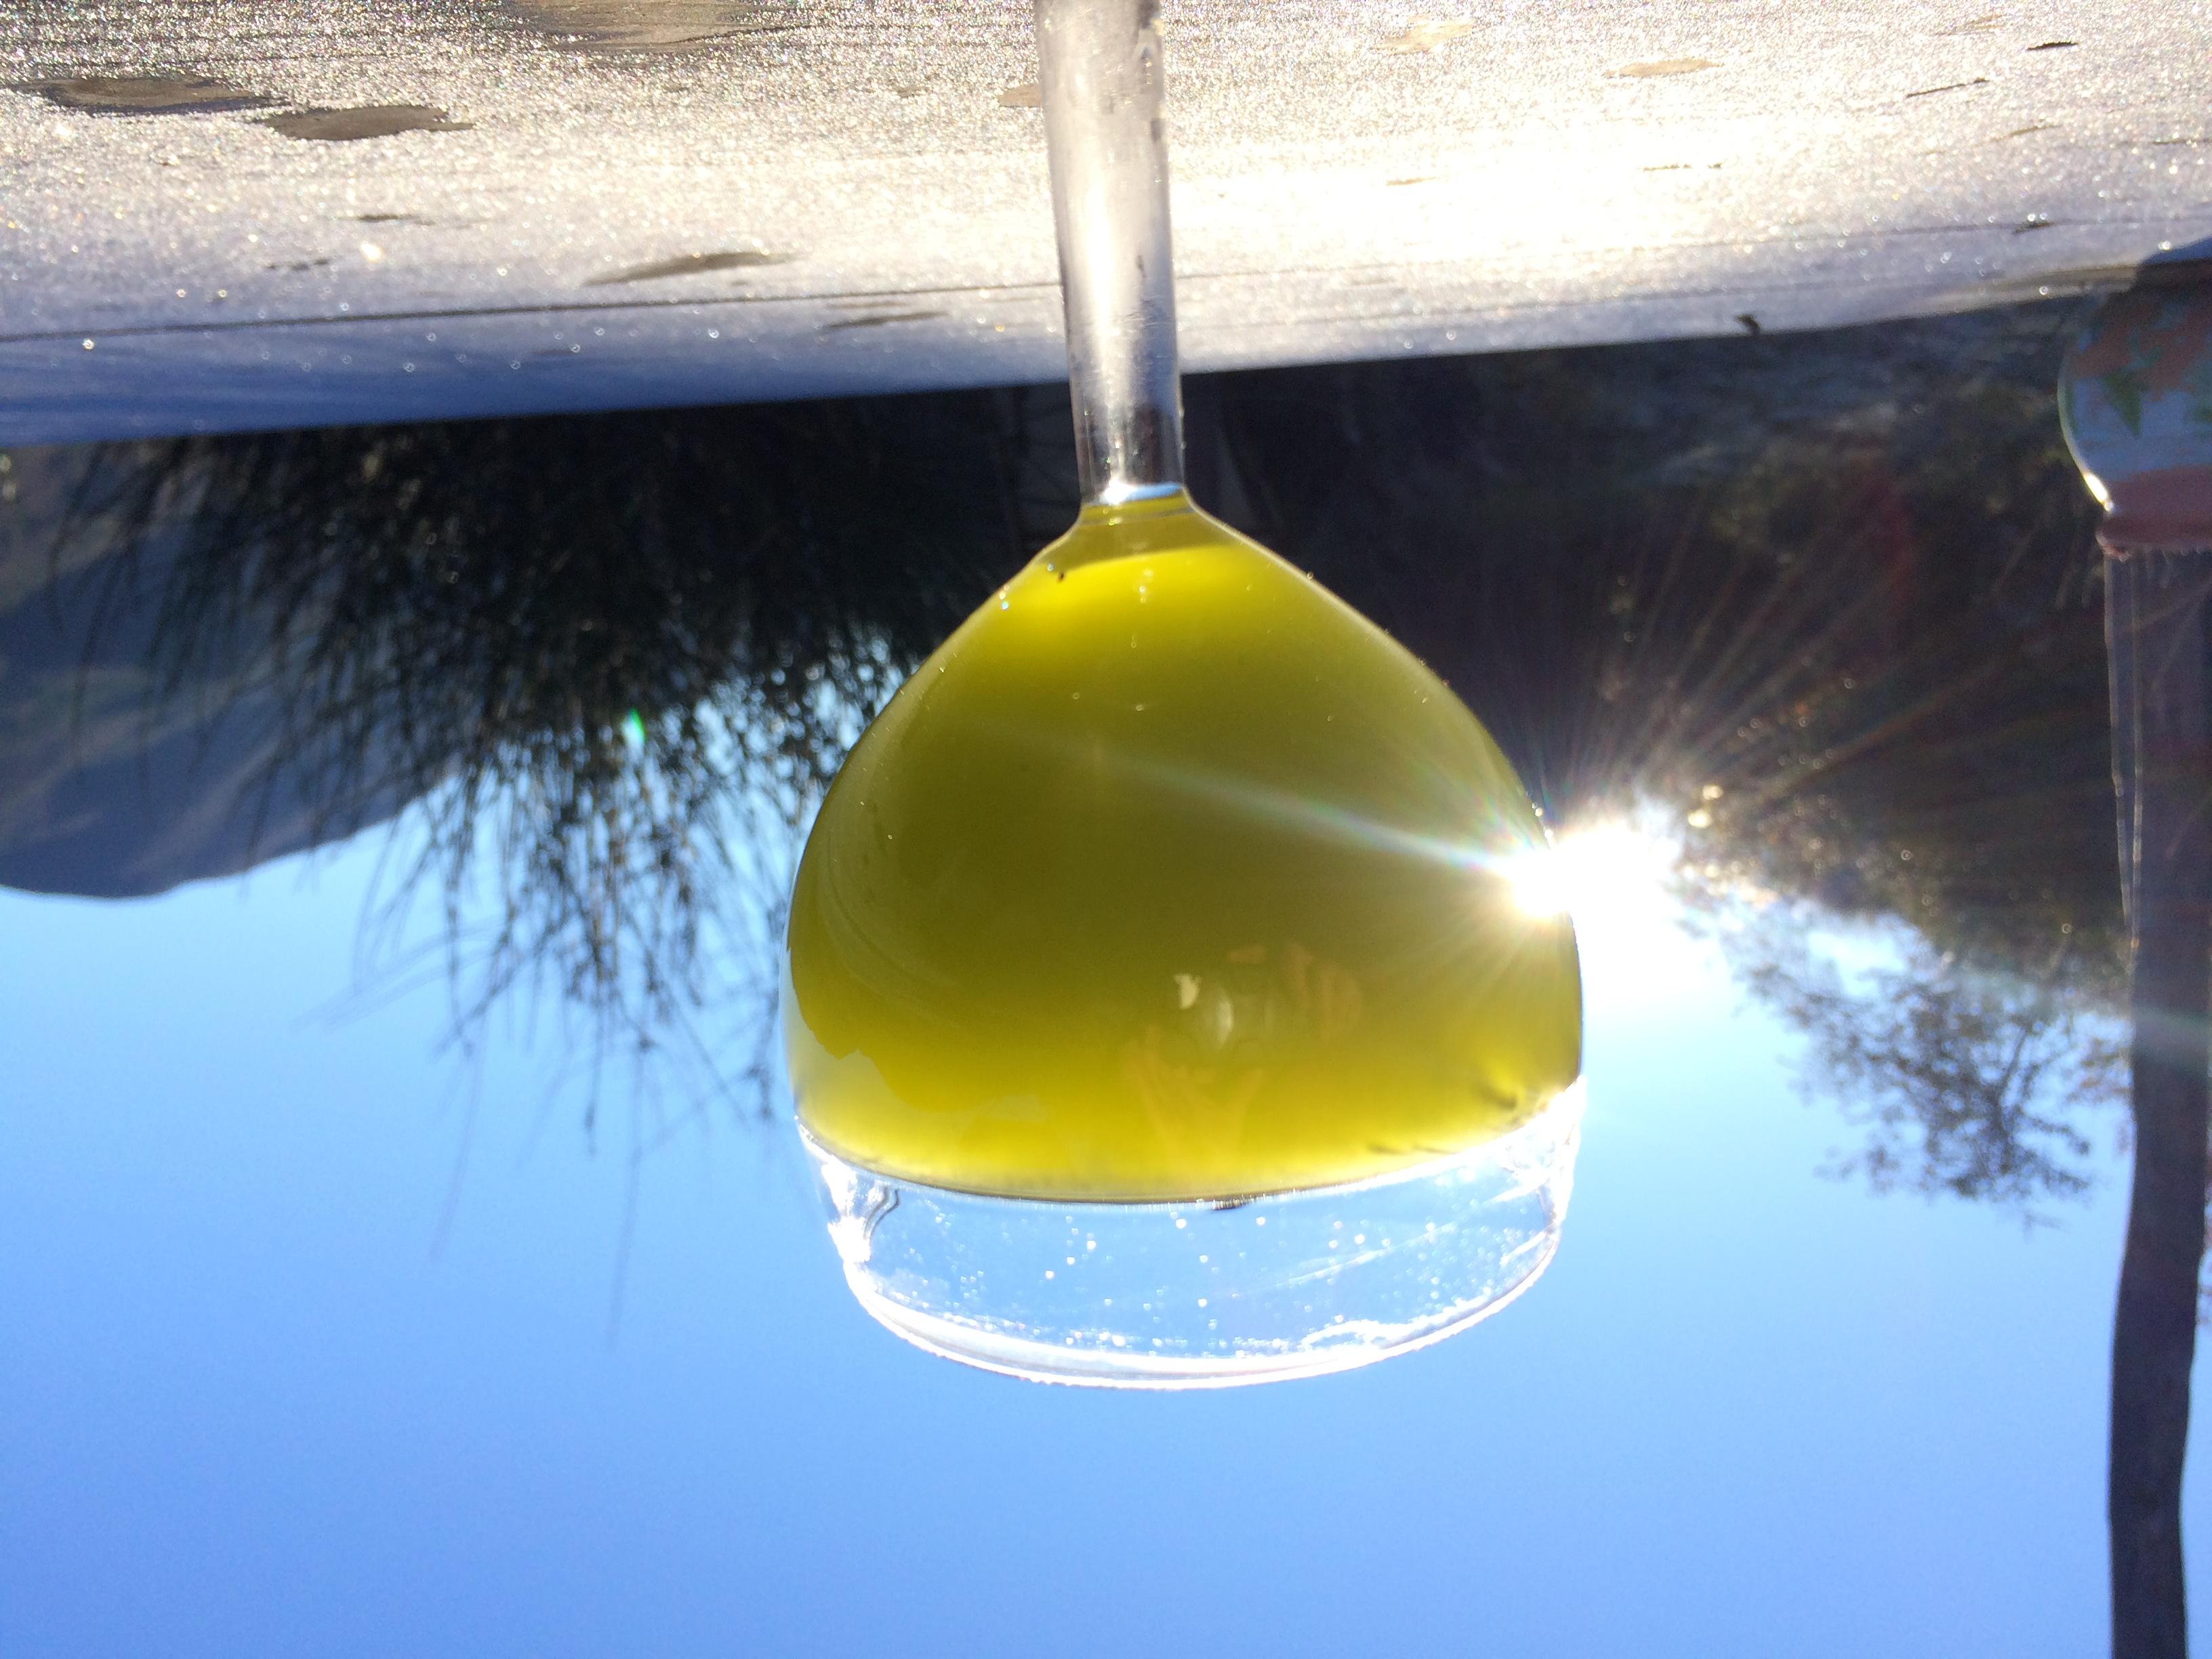 Notre huile d'olive cru 2019